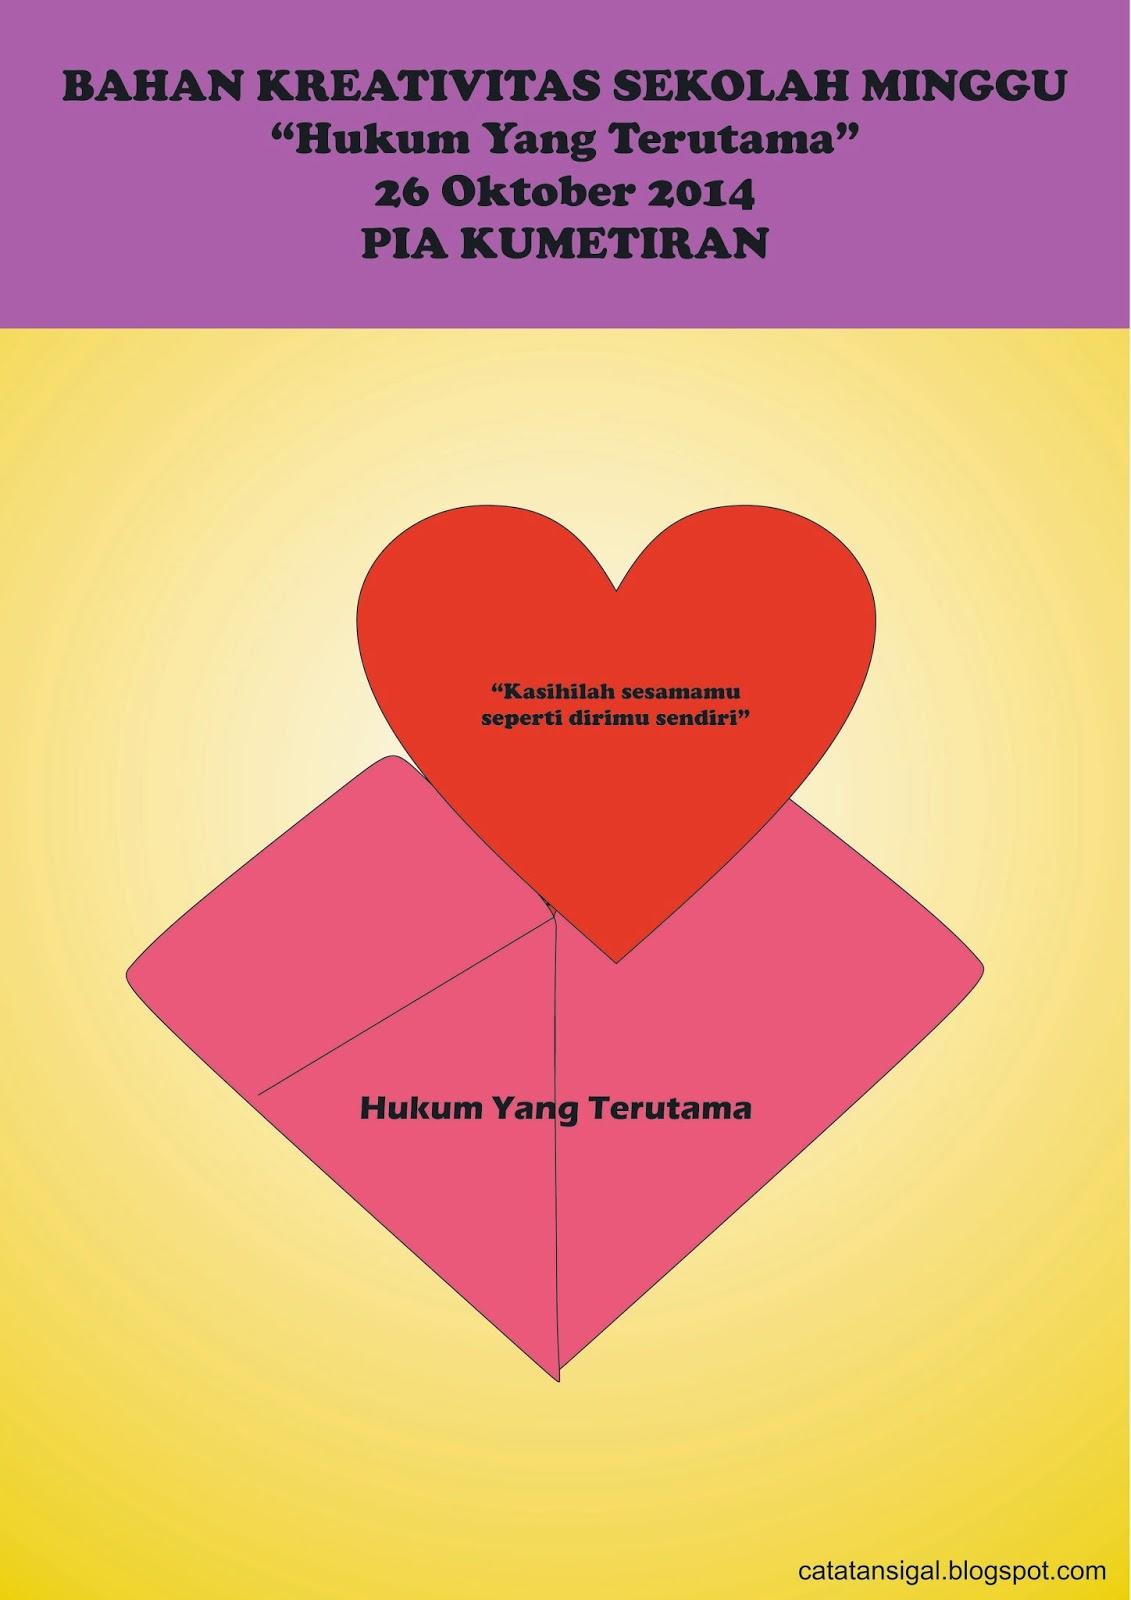 Cerita Sekolah Minggu Tentang Kasih : cerita, sekolah, minggu, tentang, kasih, Catatan, SiGal:, Bahan, Kreativitas, Sekolah, Minggu,